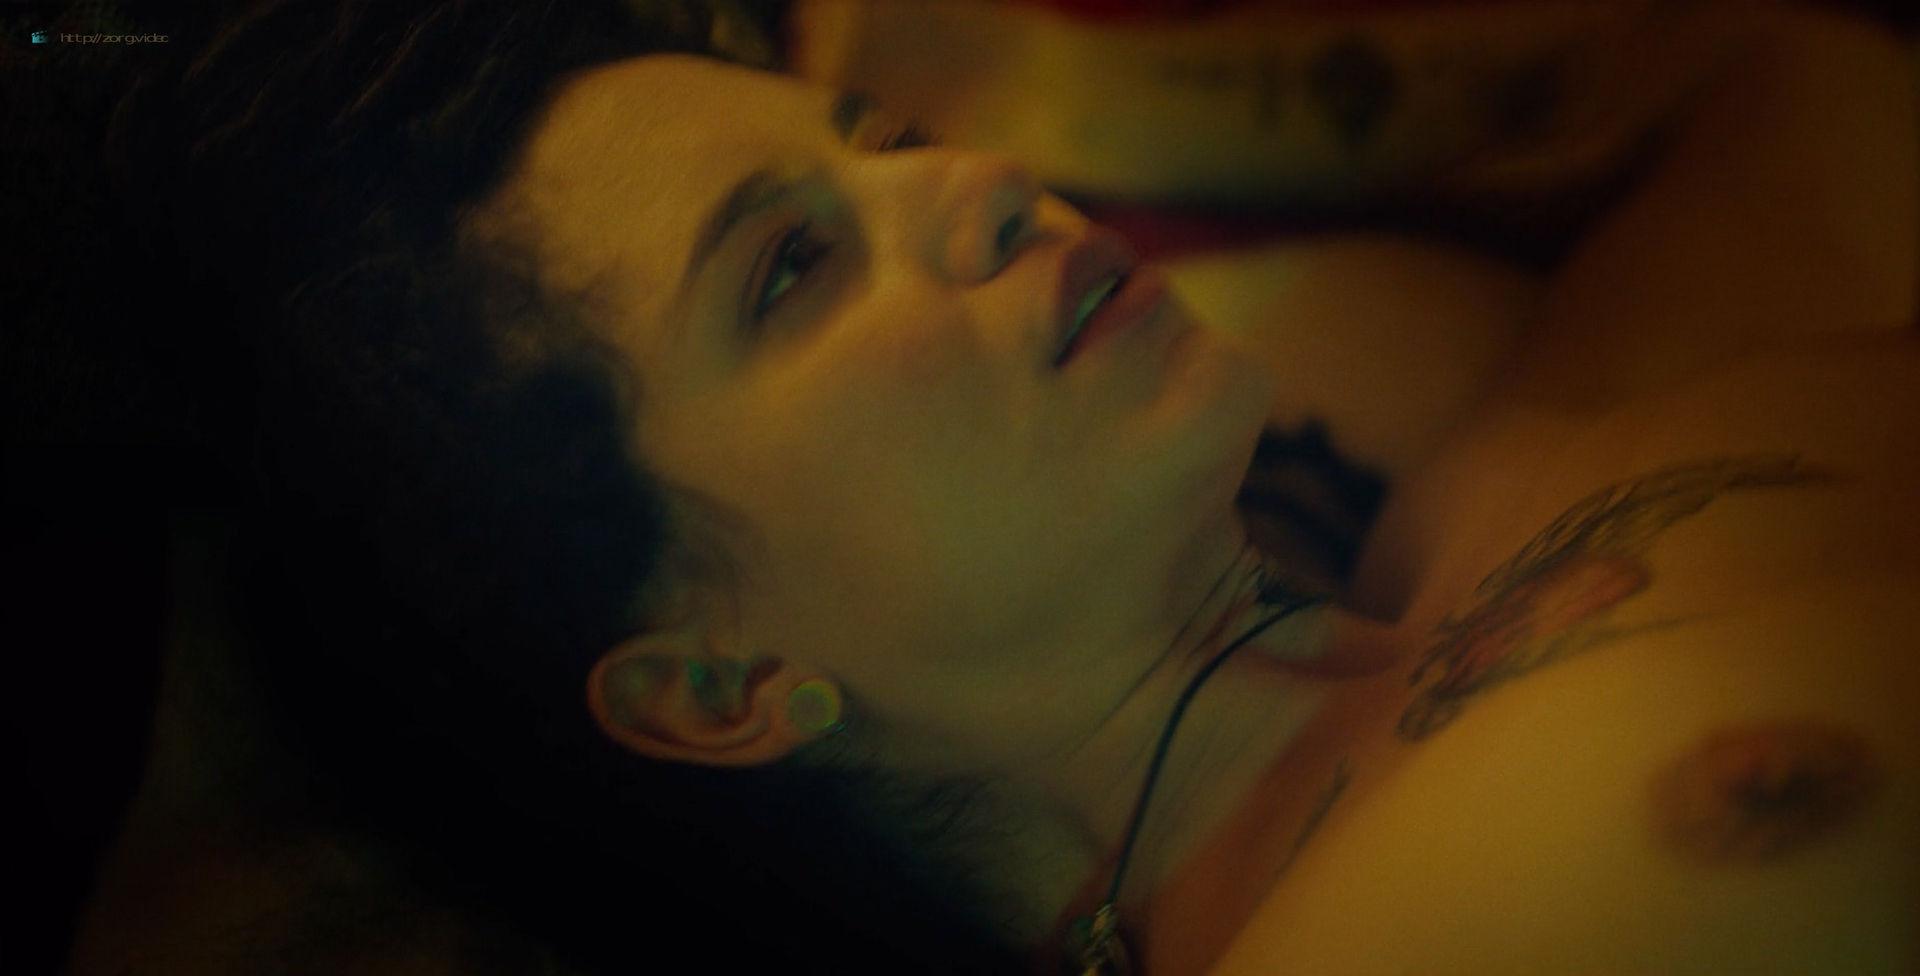 Ana Layevska nude lesbian sex with Florencia Ríos - Yankee (2019) S1 HD 1080p (12)